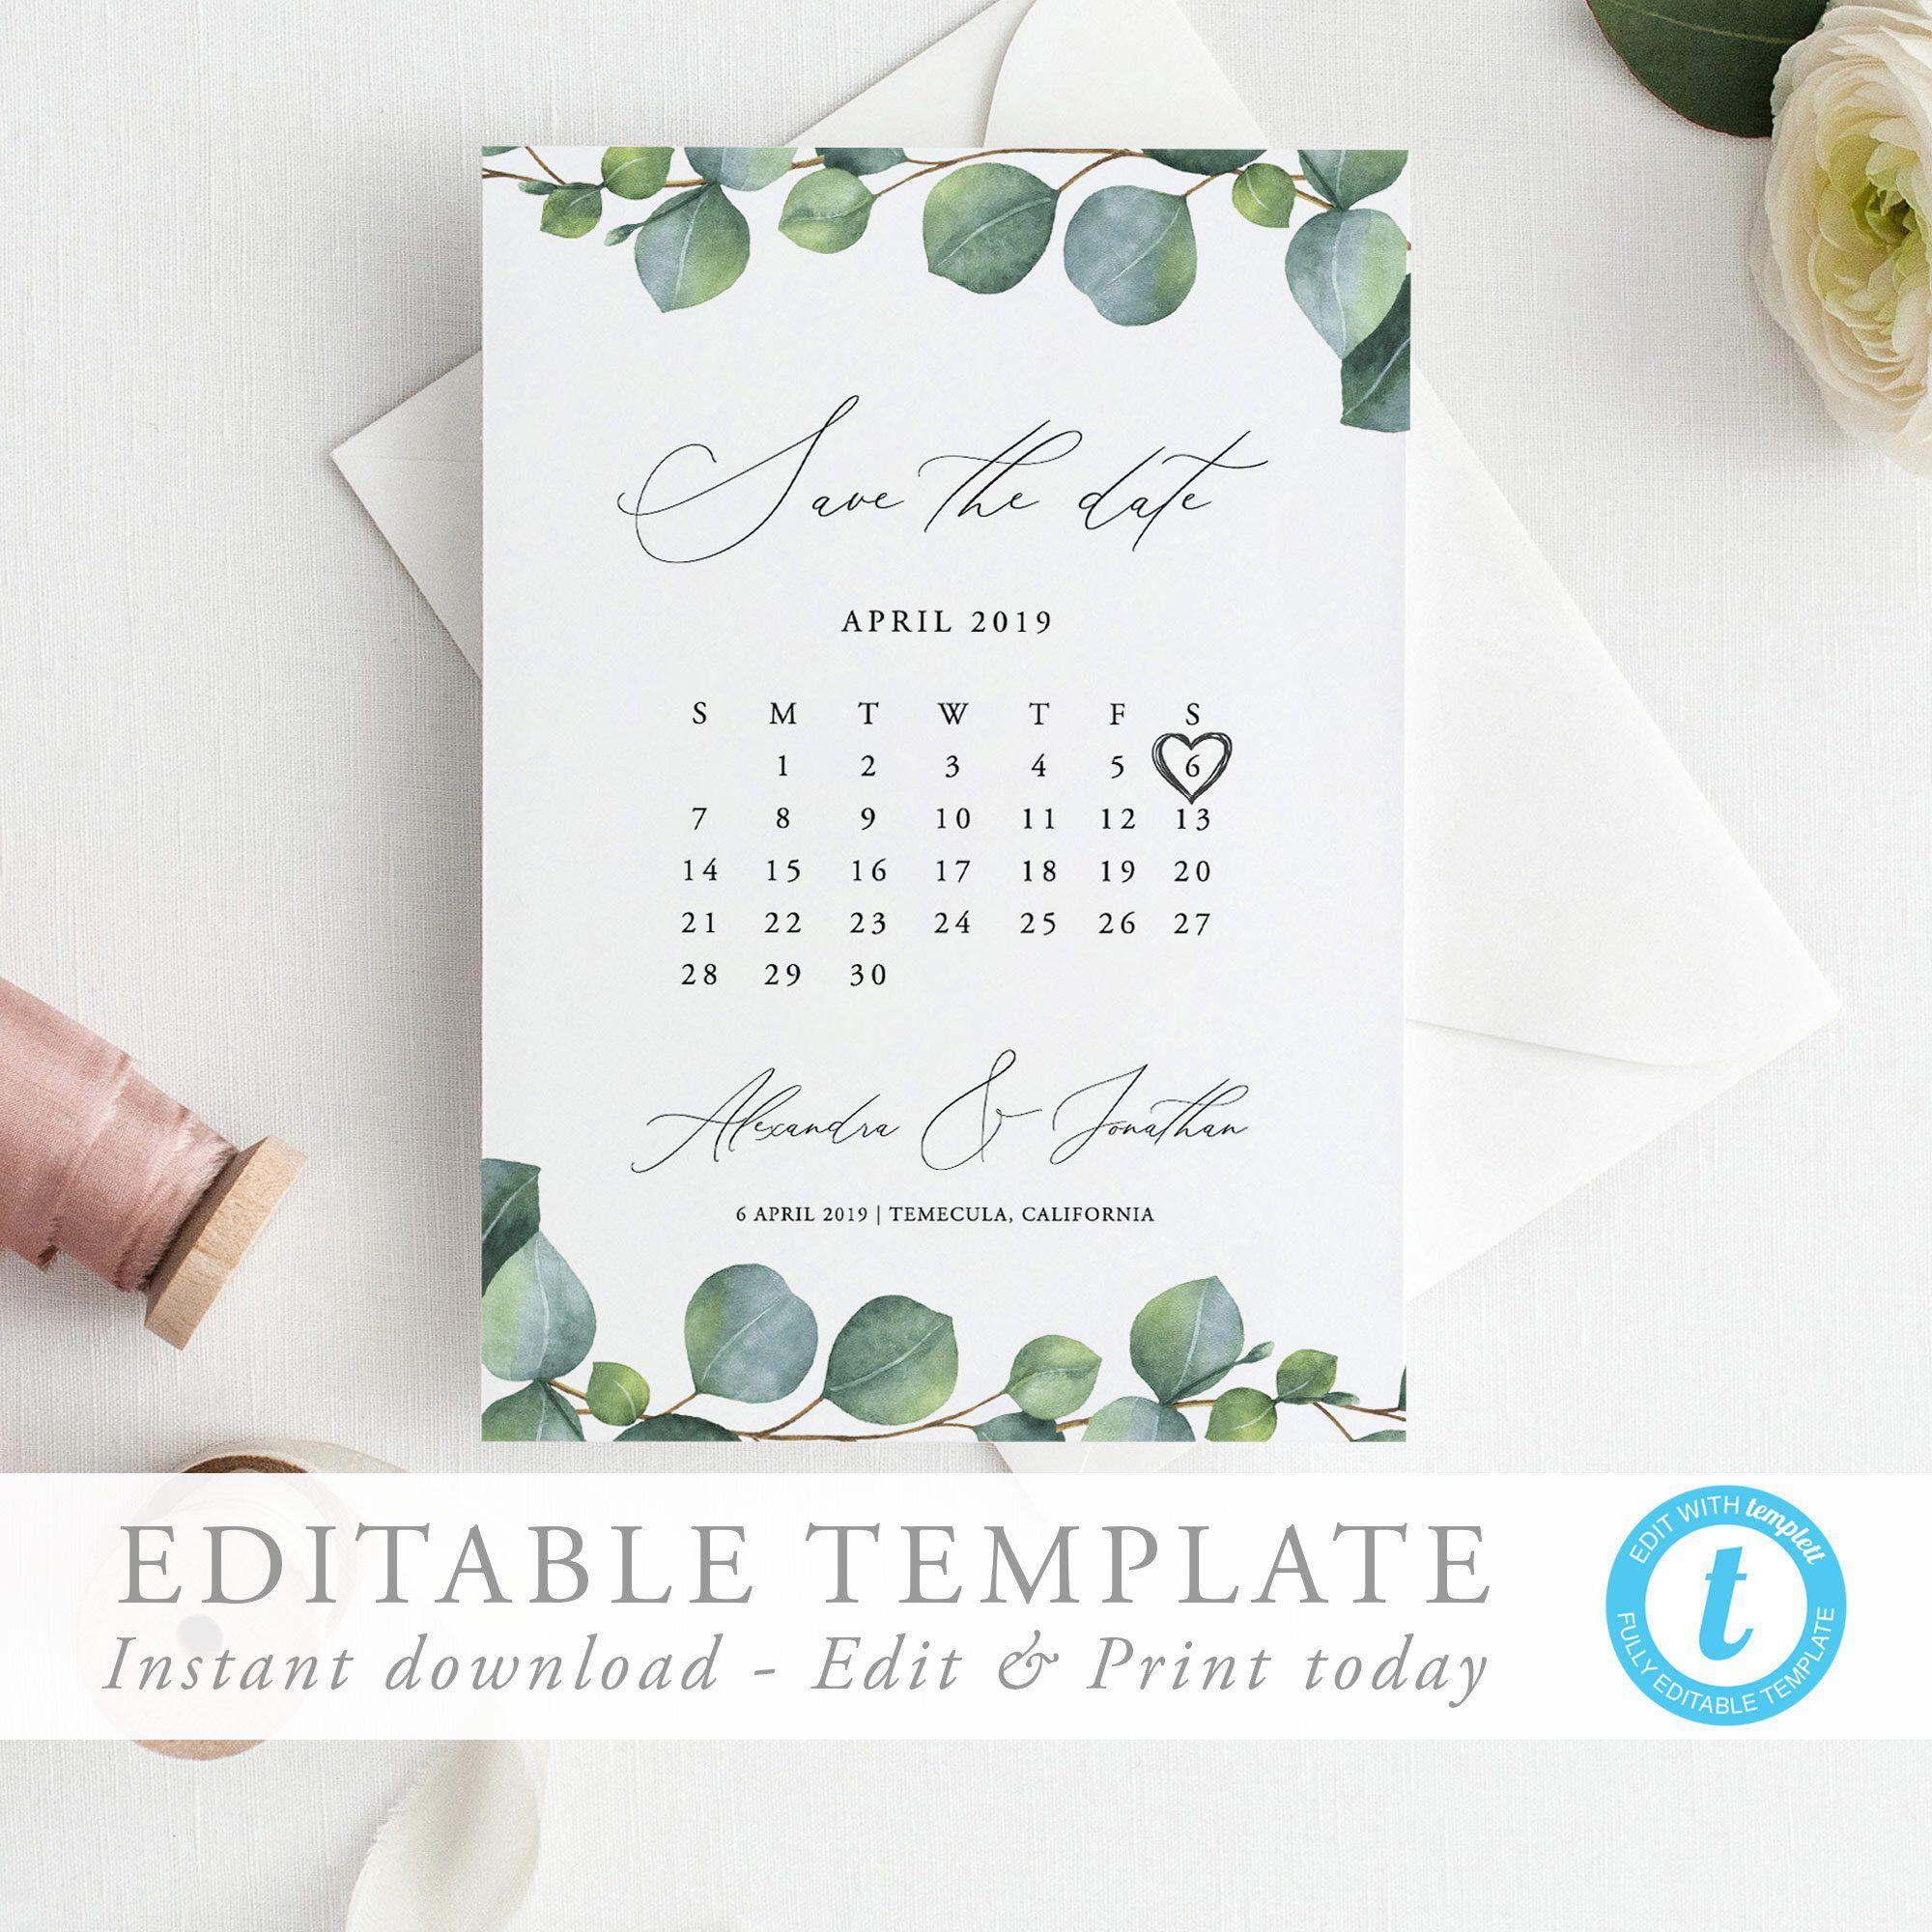 Greenery Calendar Save The Date Template Editable Invite Etsy Save The Date Templates Save The Date Editable Invitations